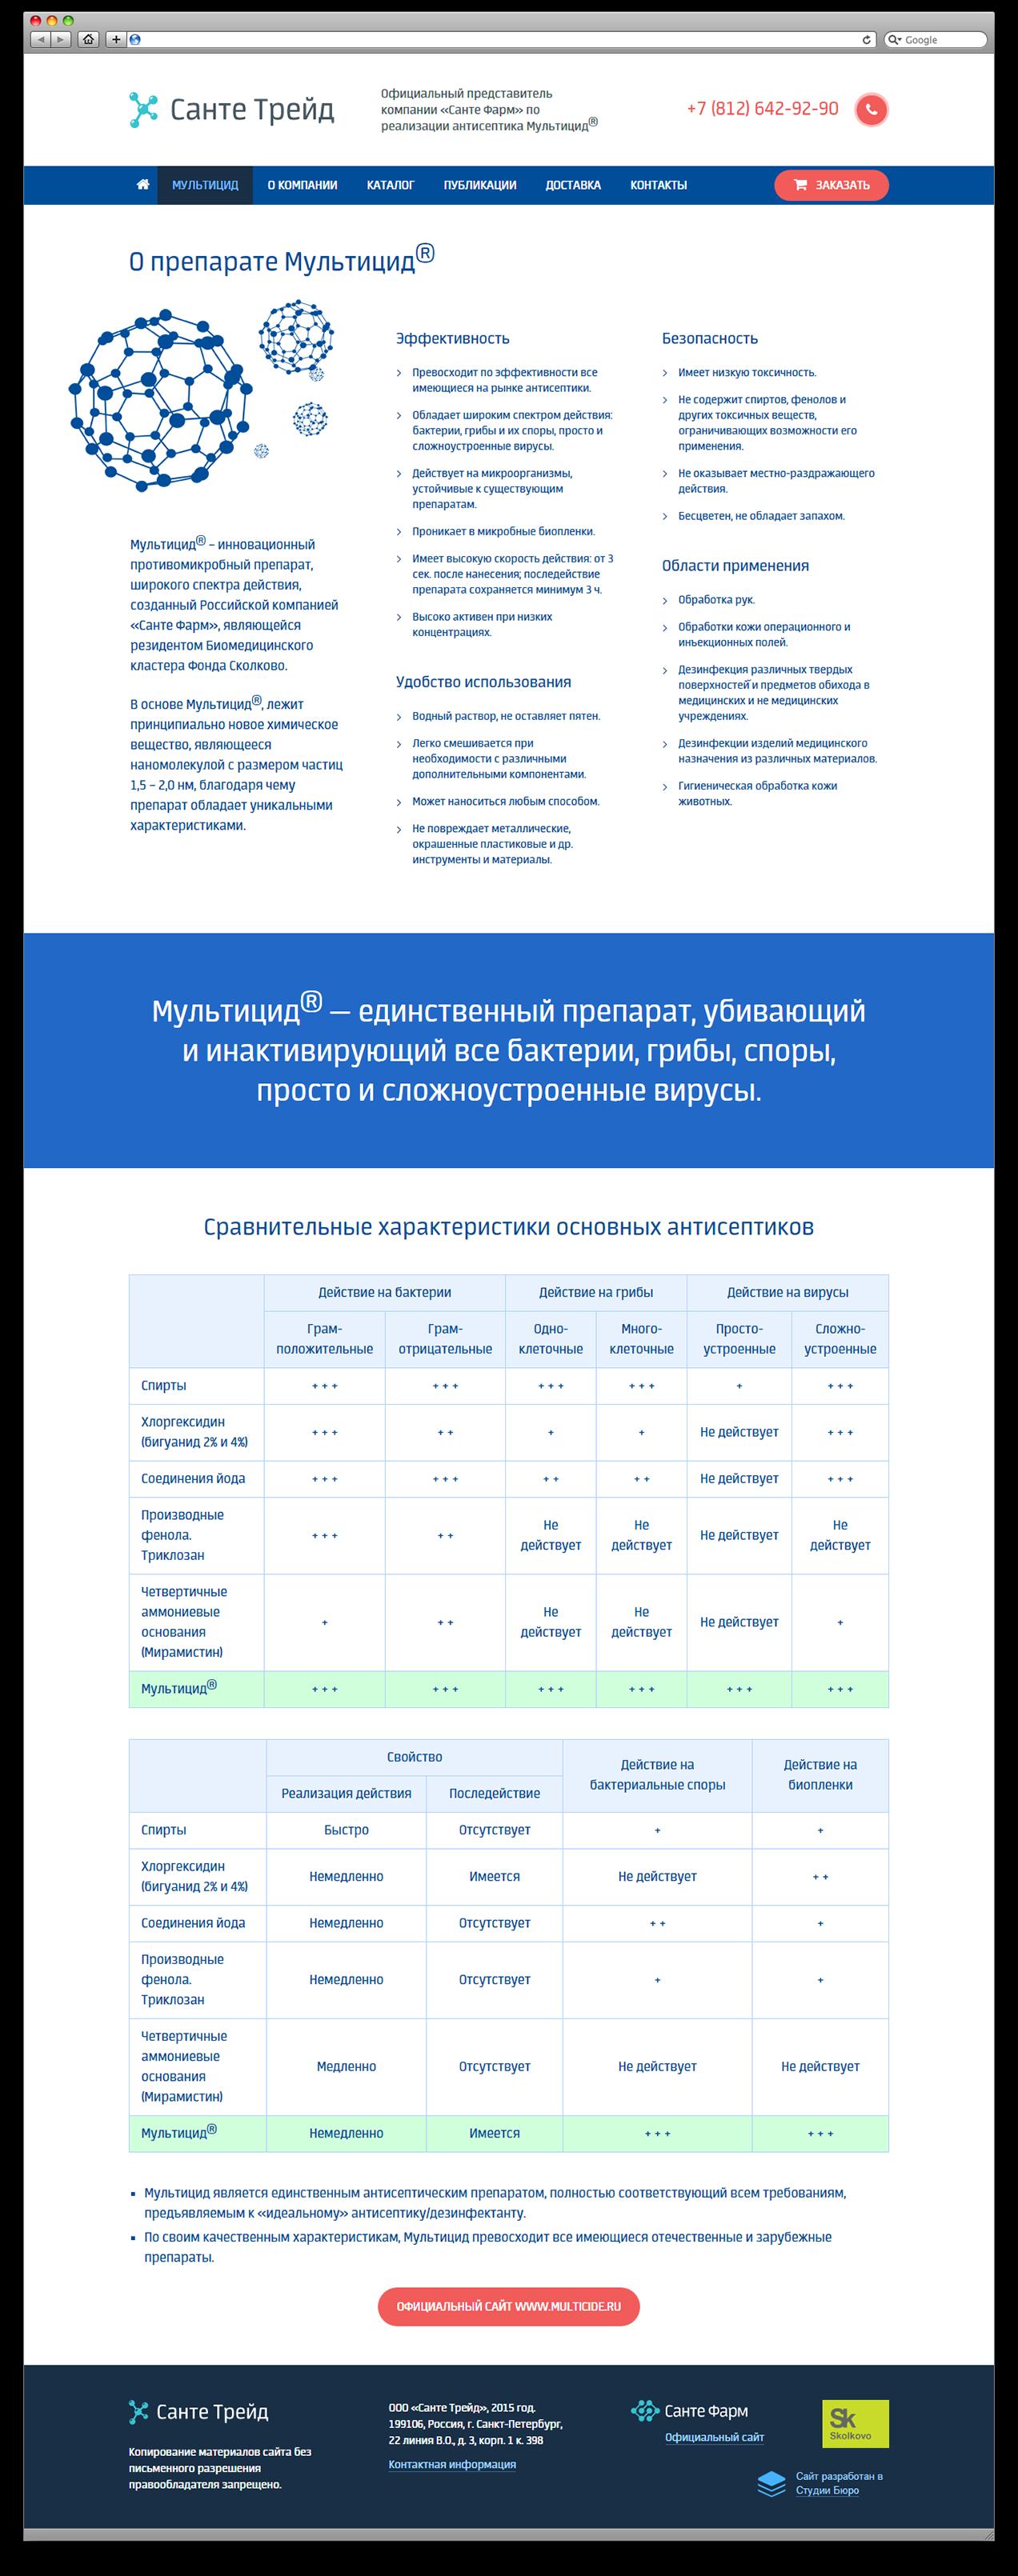 Сайт ООО «Санте Трейд», г. Санкт-Петербург